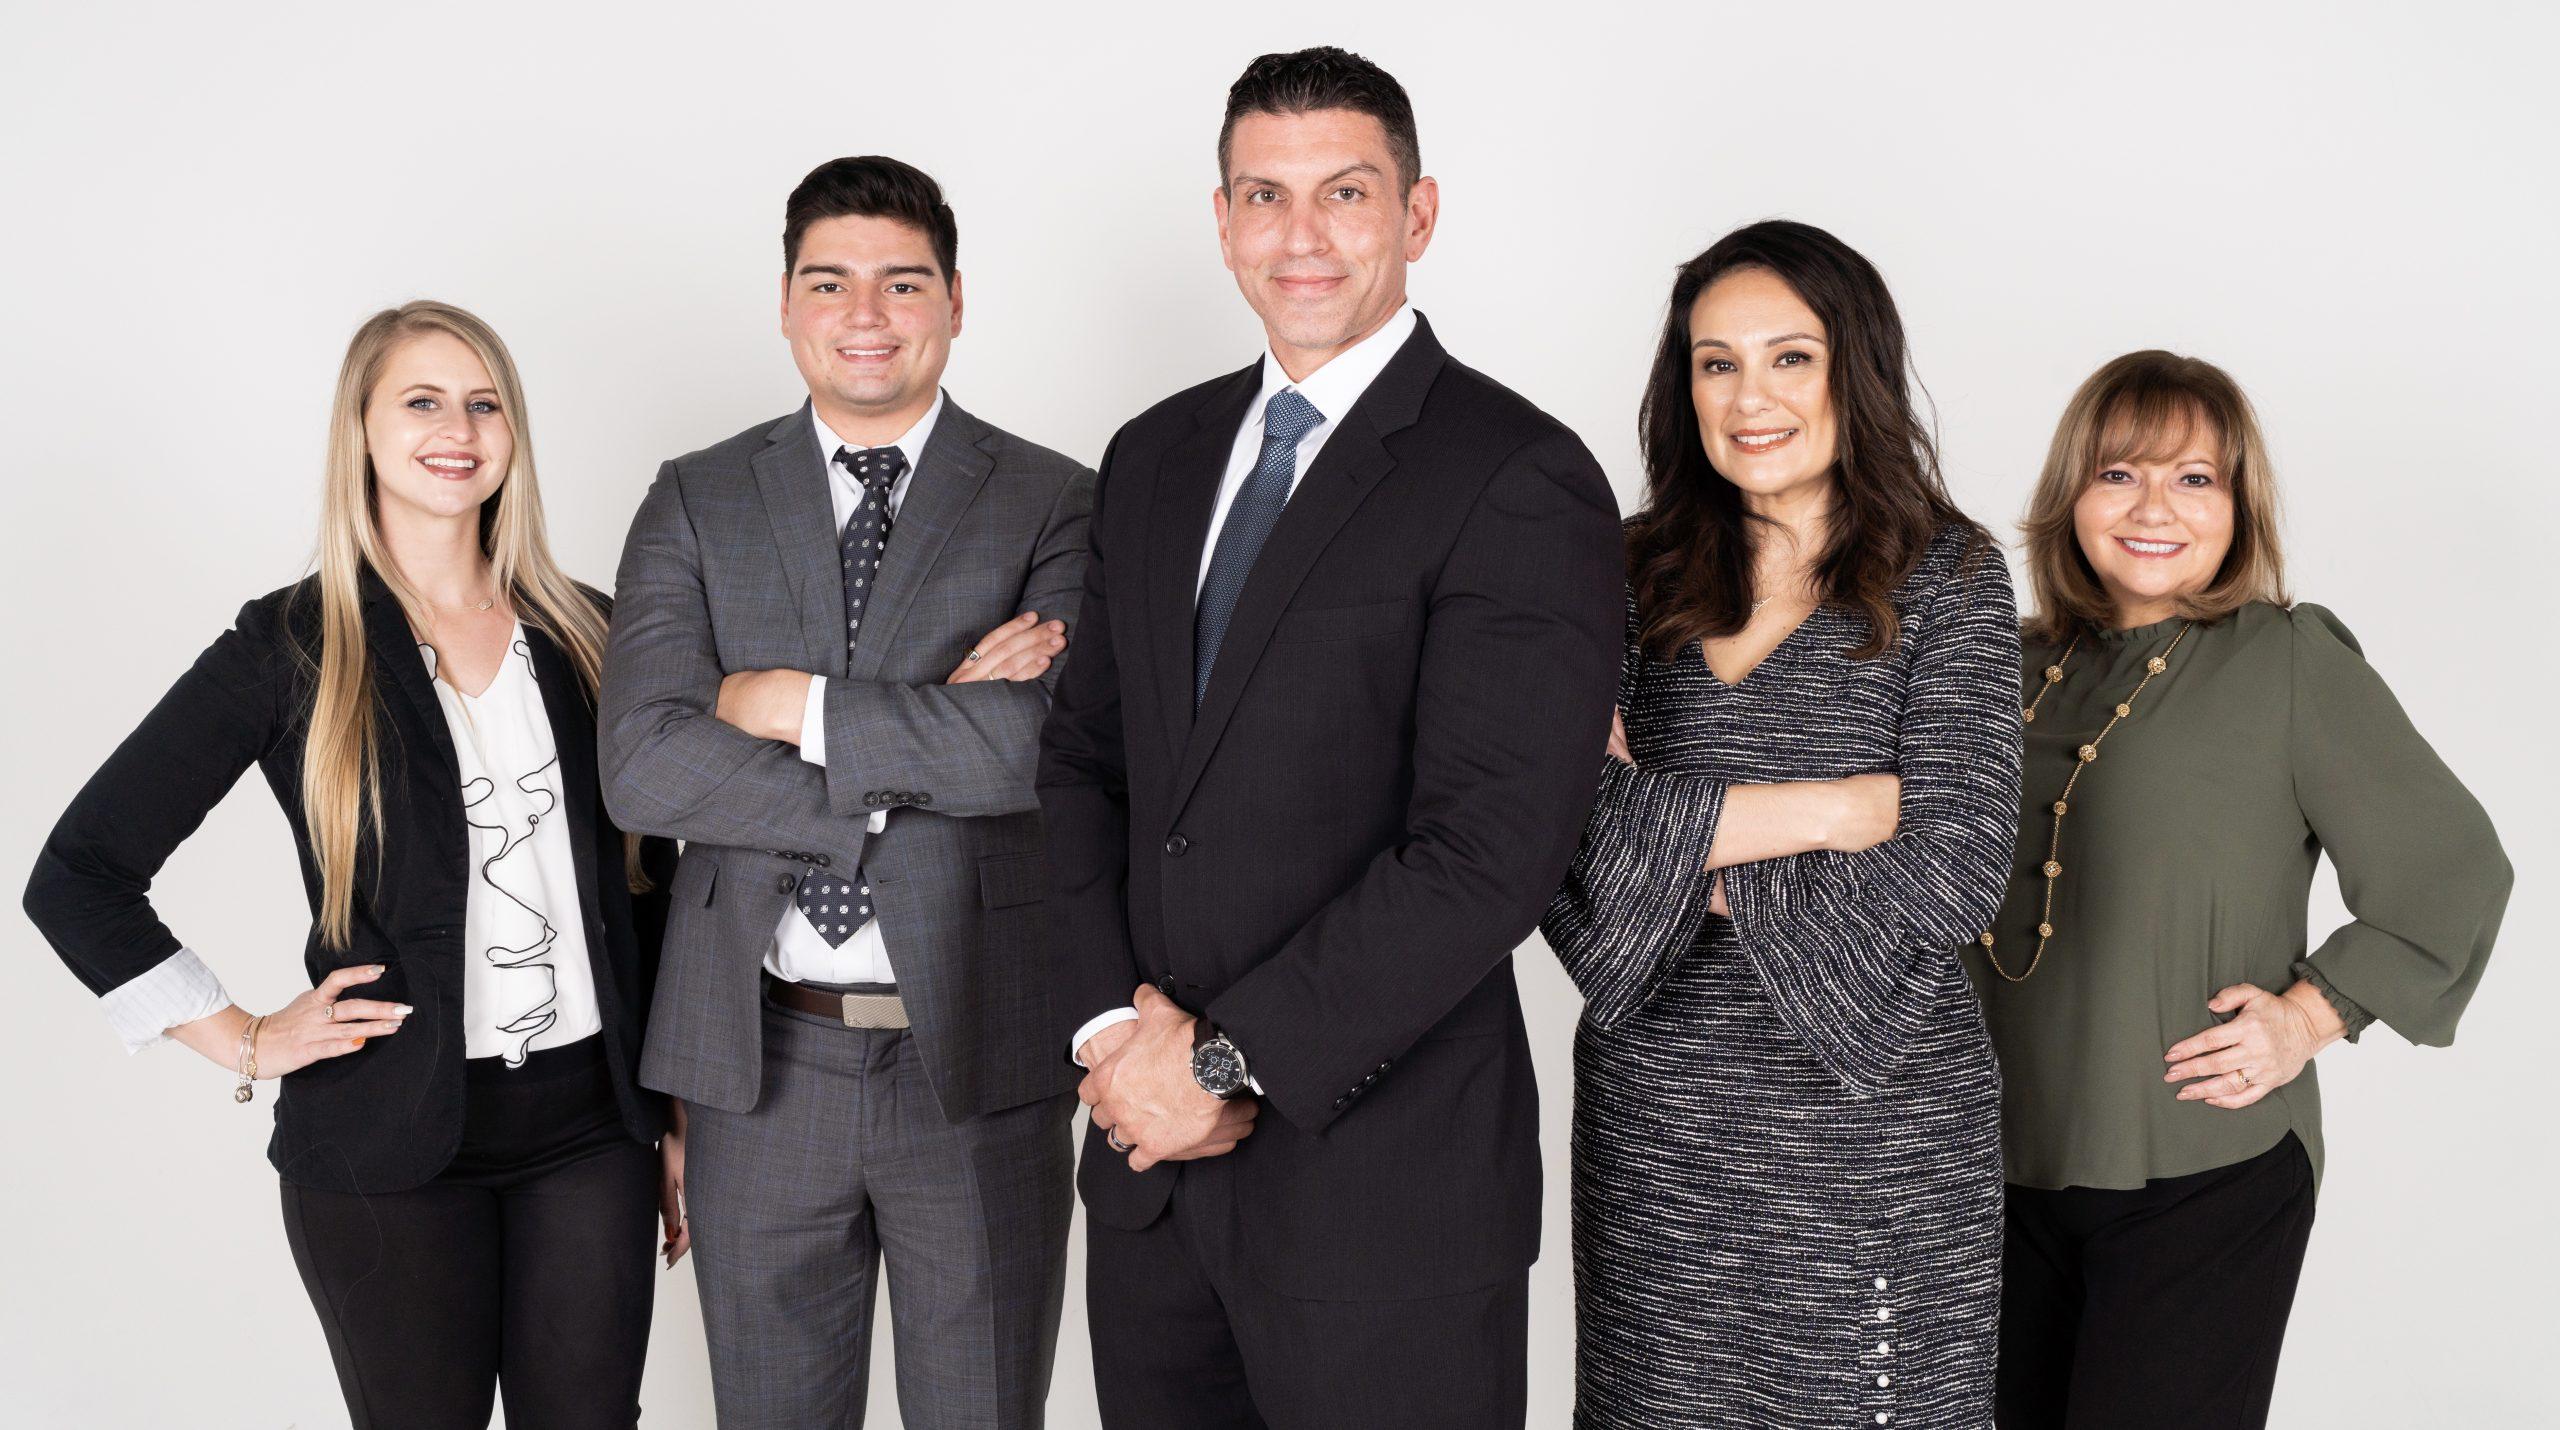 North Star Senior Advisors team picture